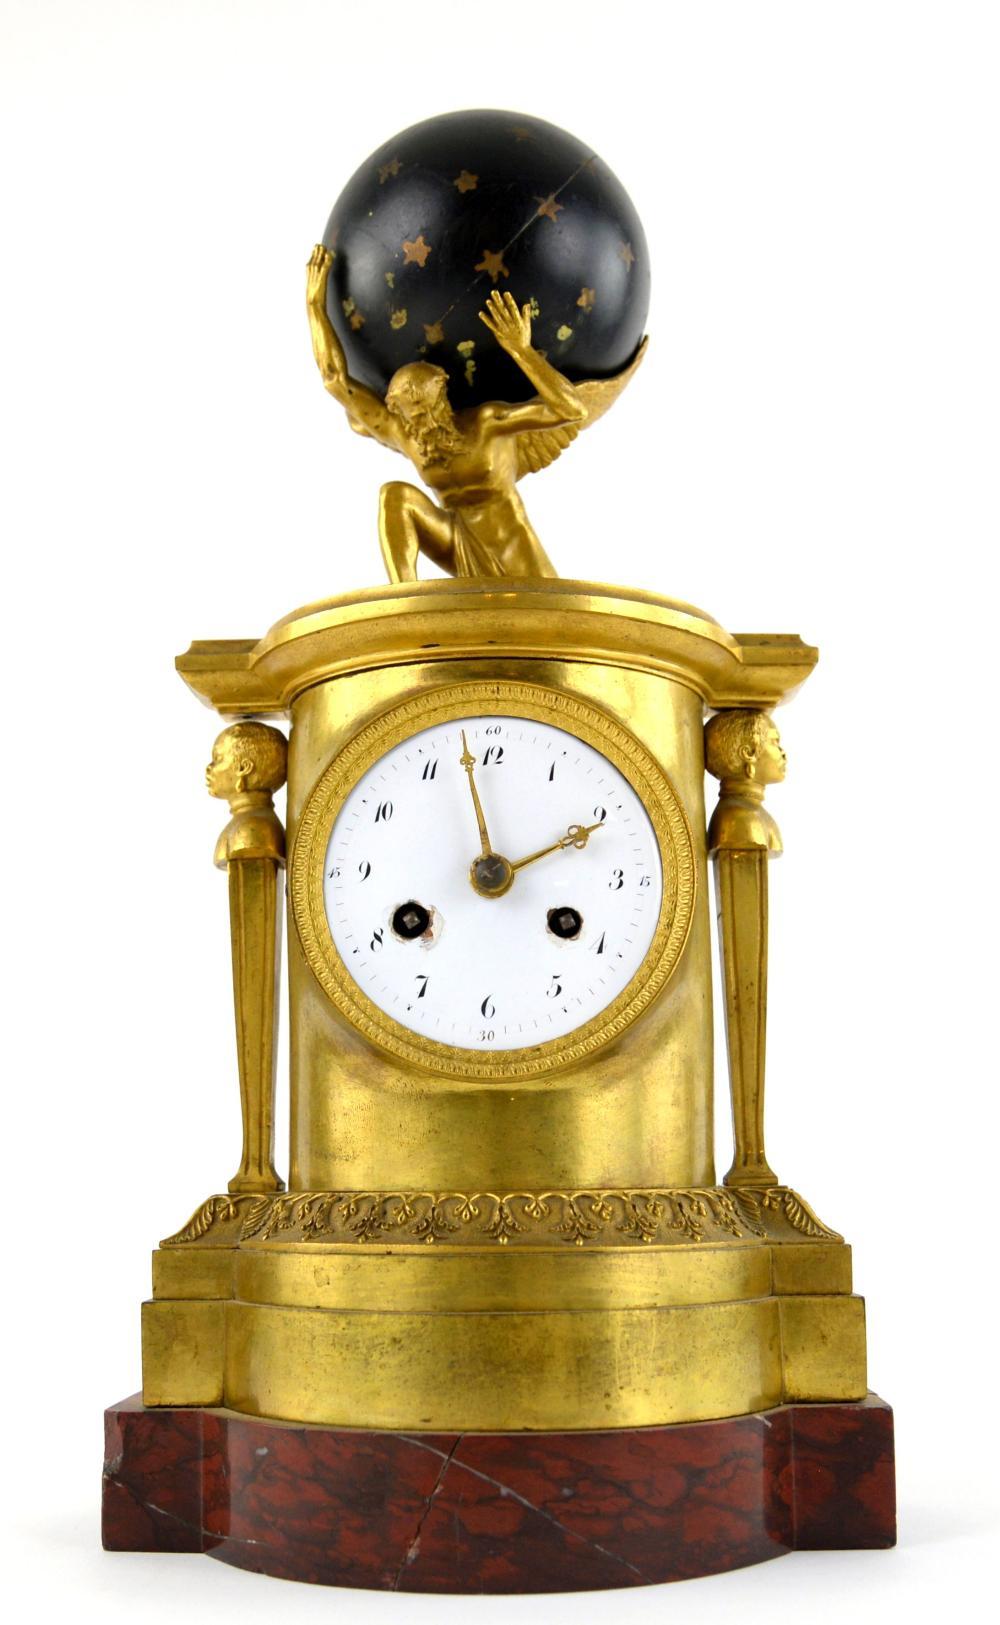 19th century French Empire gilt metal mantel clock